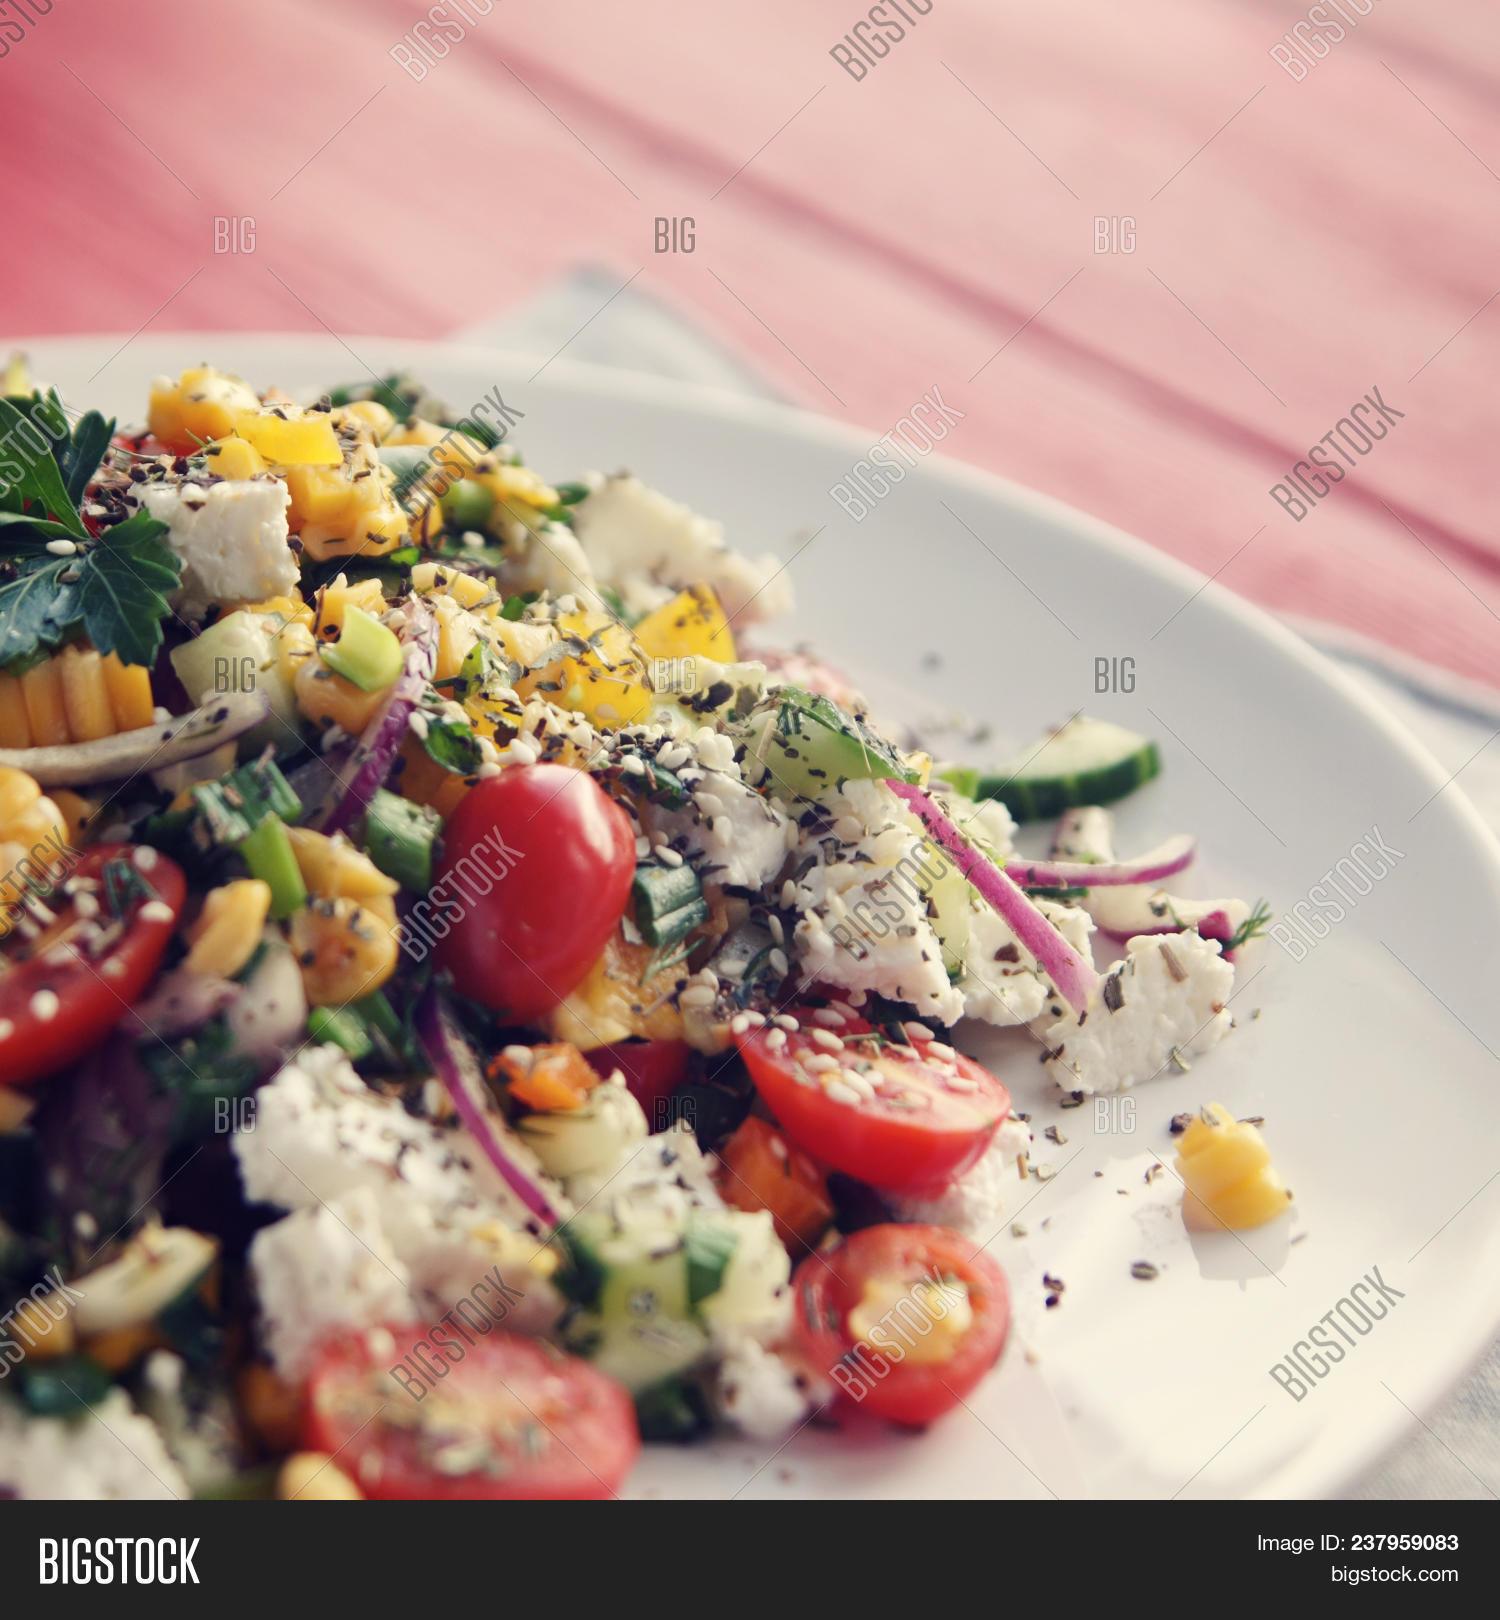 Terrific Colorful Vegetable Mix Image Photo Free Trial Bigstock Interior Design Ideas Clesiryabchikinfo